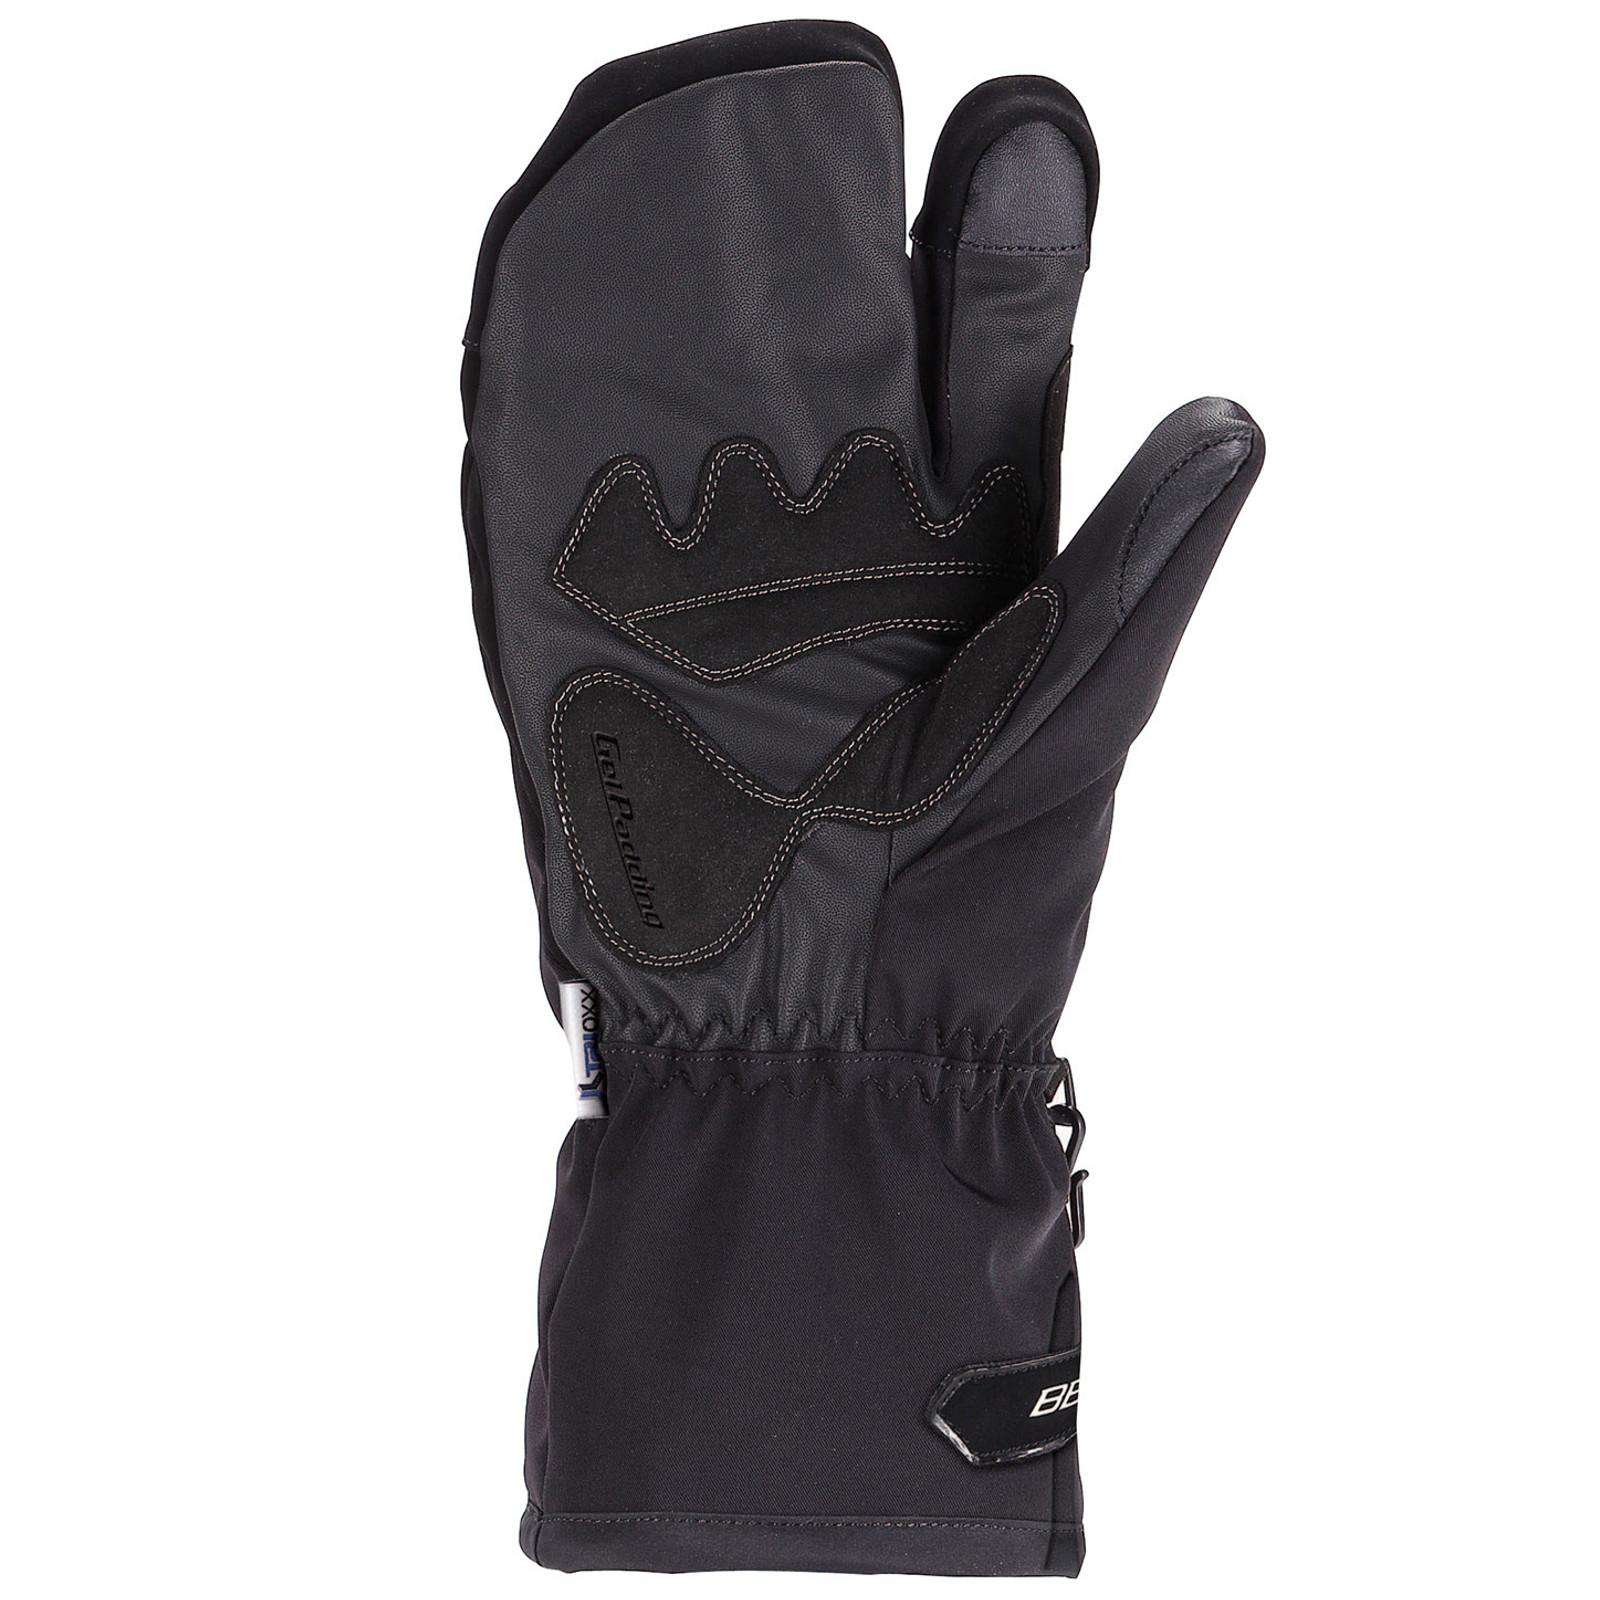 Bbb Subzero Windproof & Waterproof Keep Warm Winter Cycling Cycling Cycling Commuter Gloves 5709e5